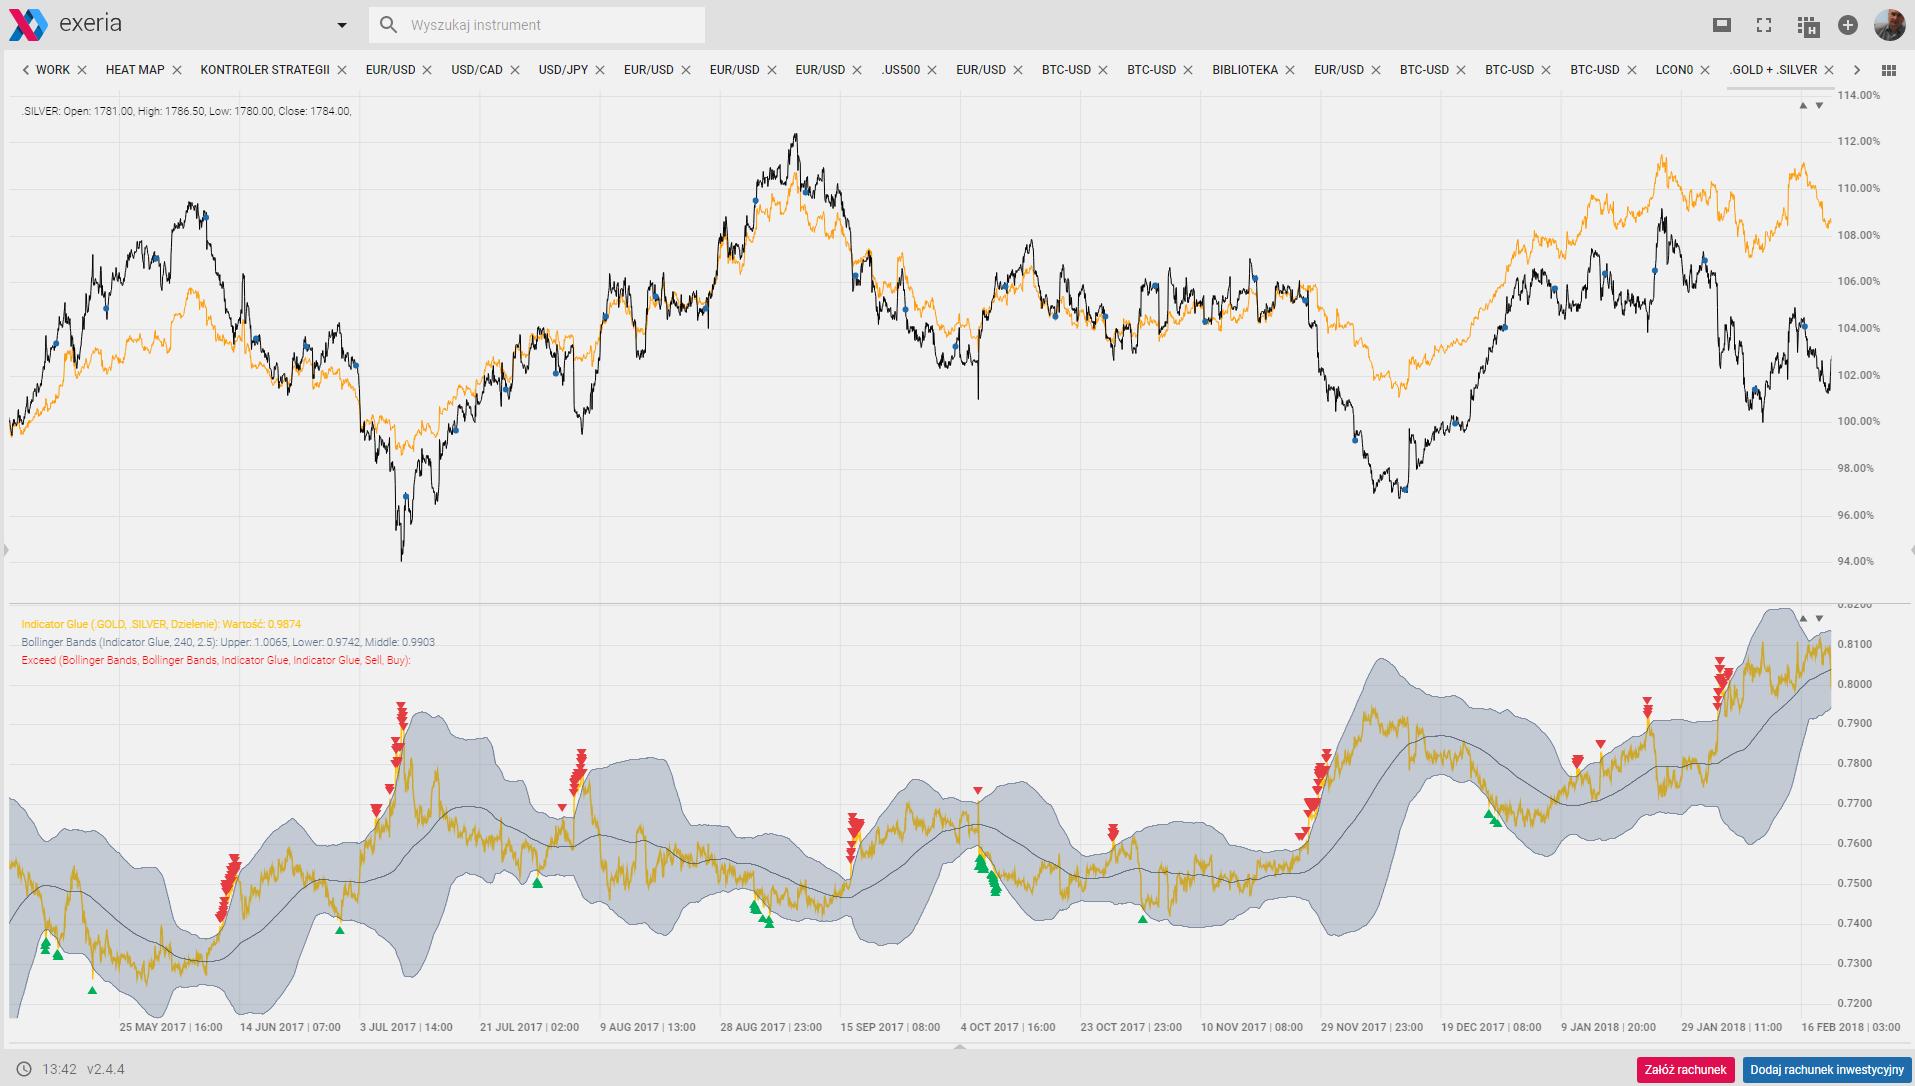 Handel w parach, pairs trading, analysis, arbitrage, statistical arbitrage, gold, silver